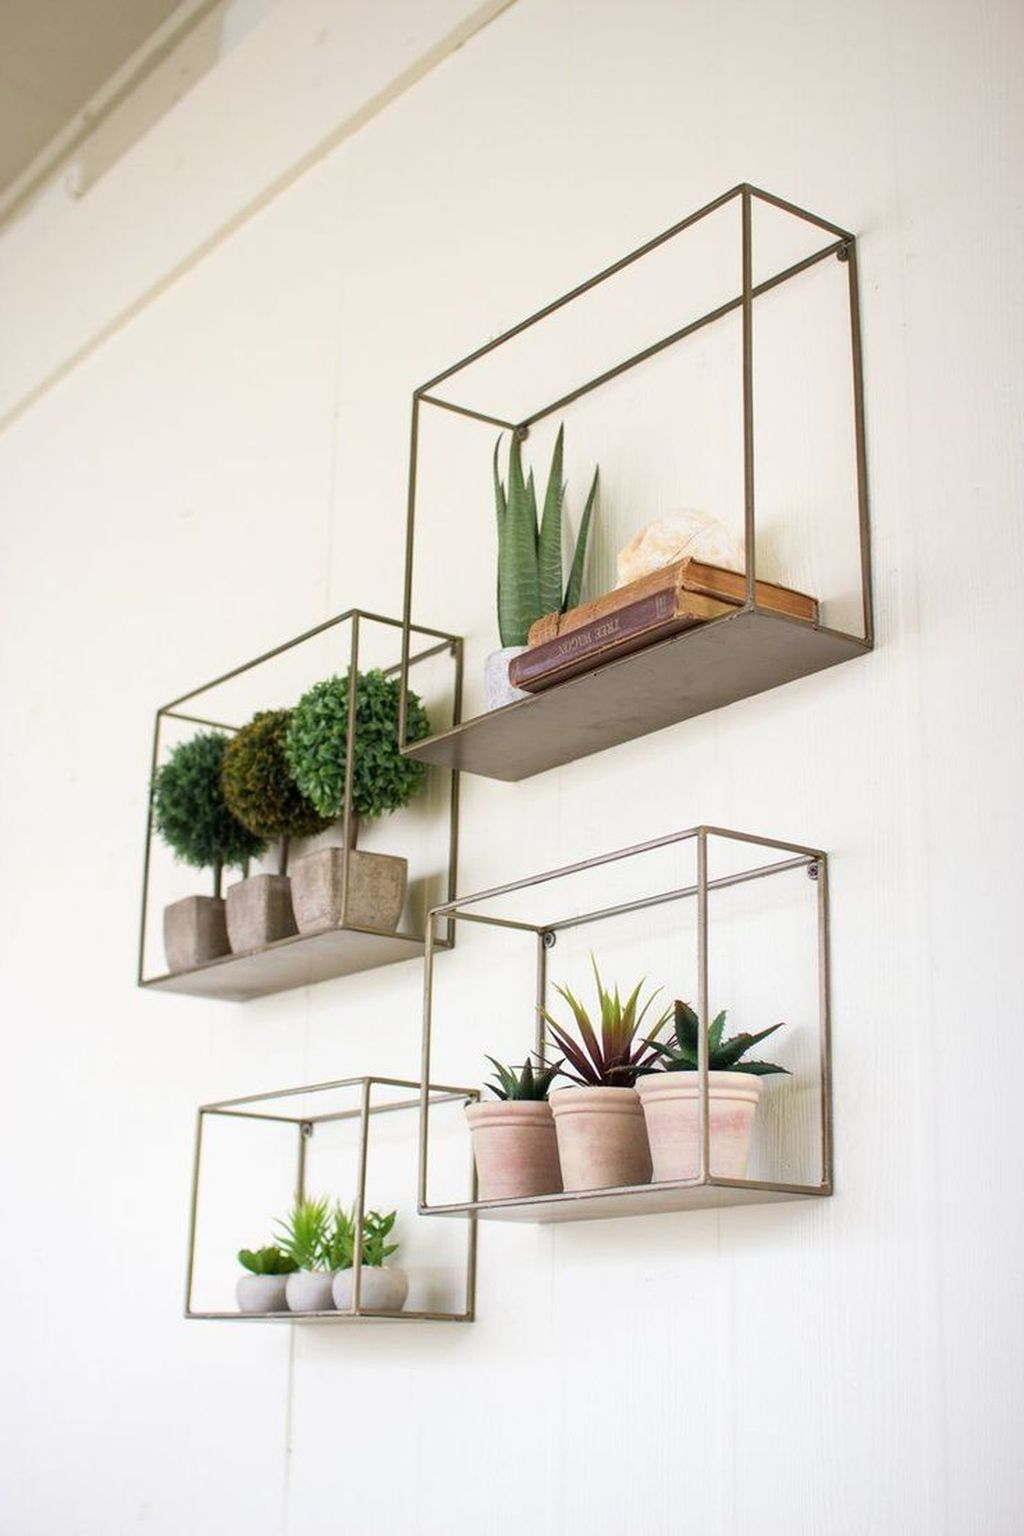 Superb Handmade Home Décor Ideas For Home Look Great 07